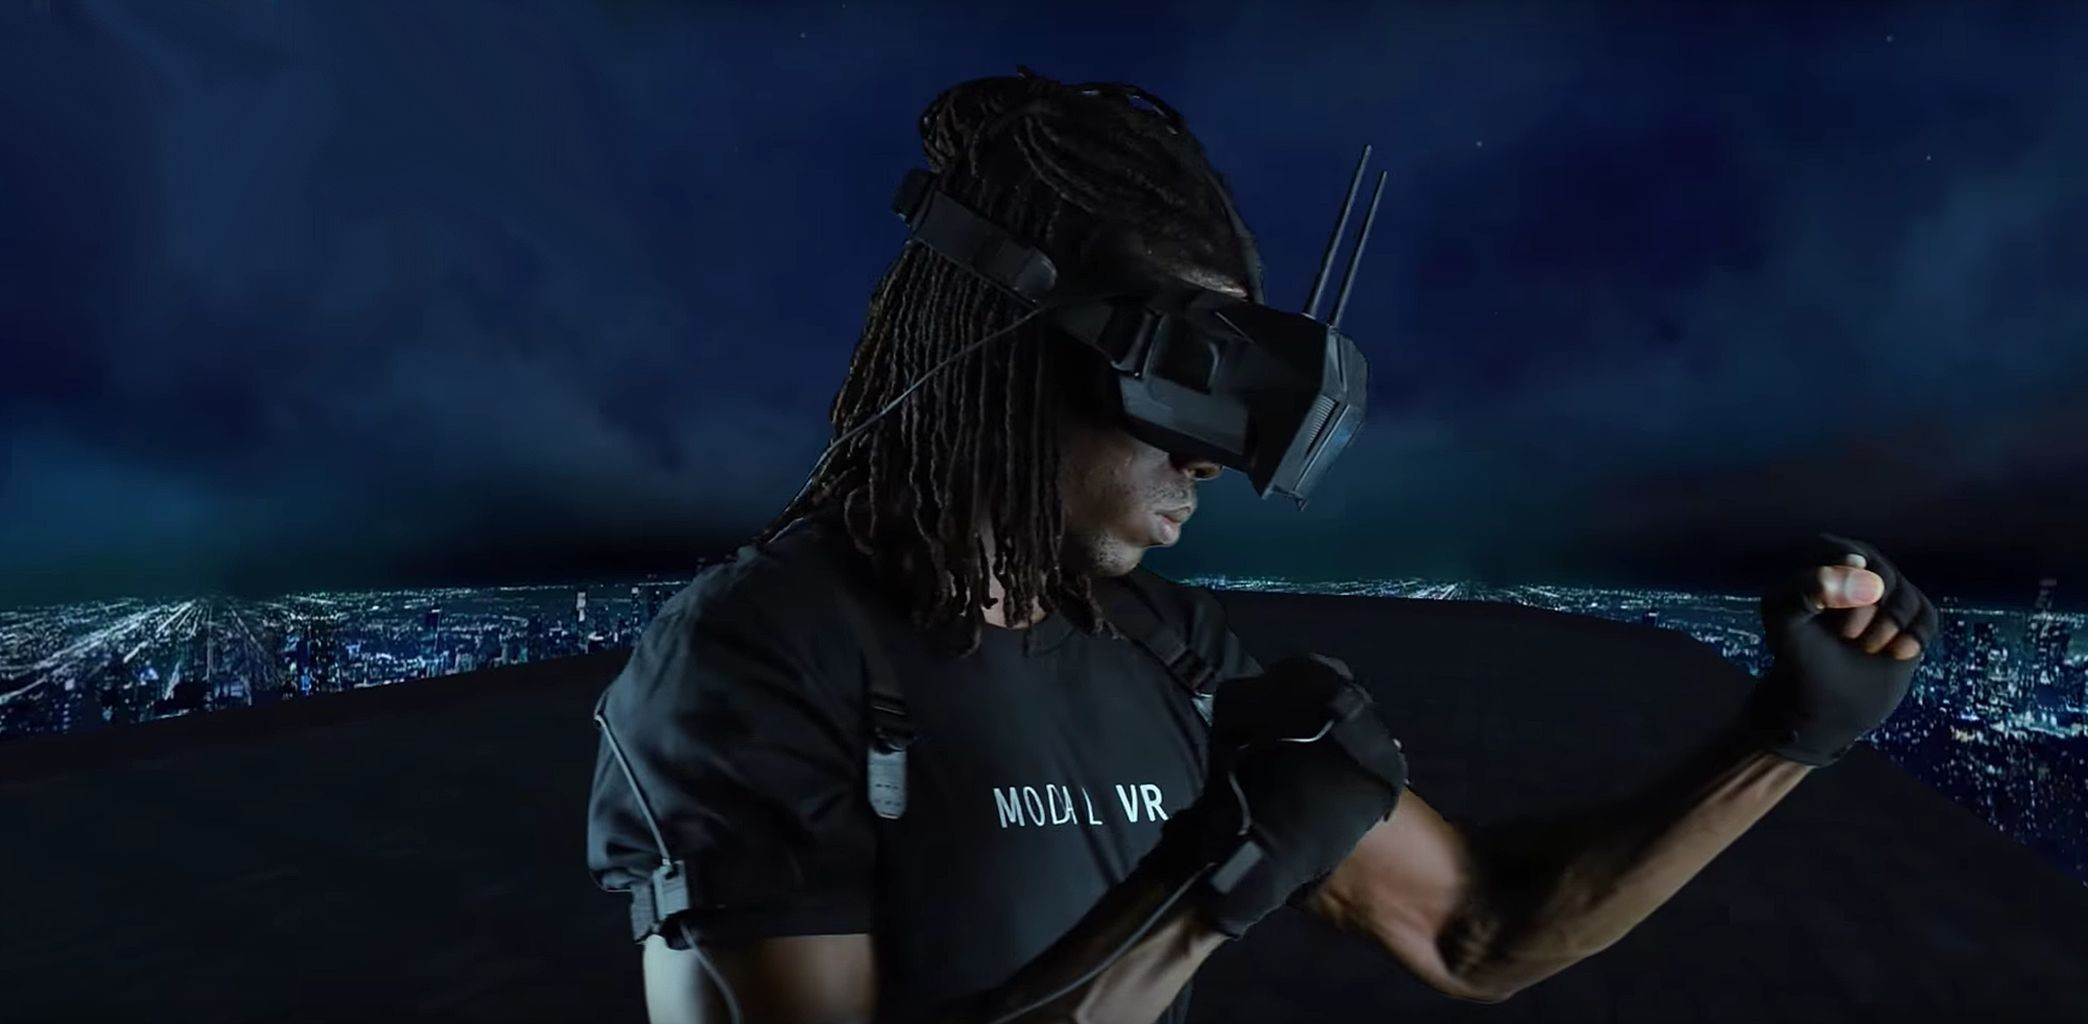 Wallpaper Modal Vr Vr Atari Virtual Reality Vr Headset